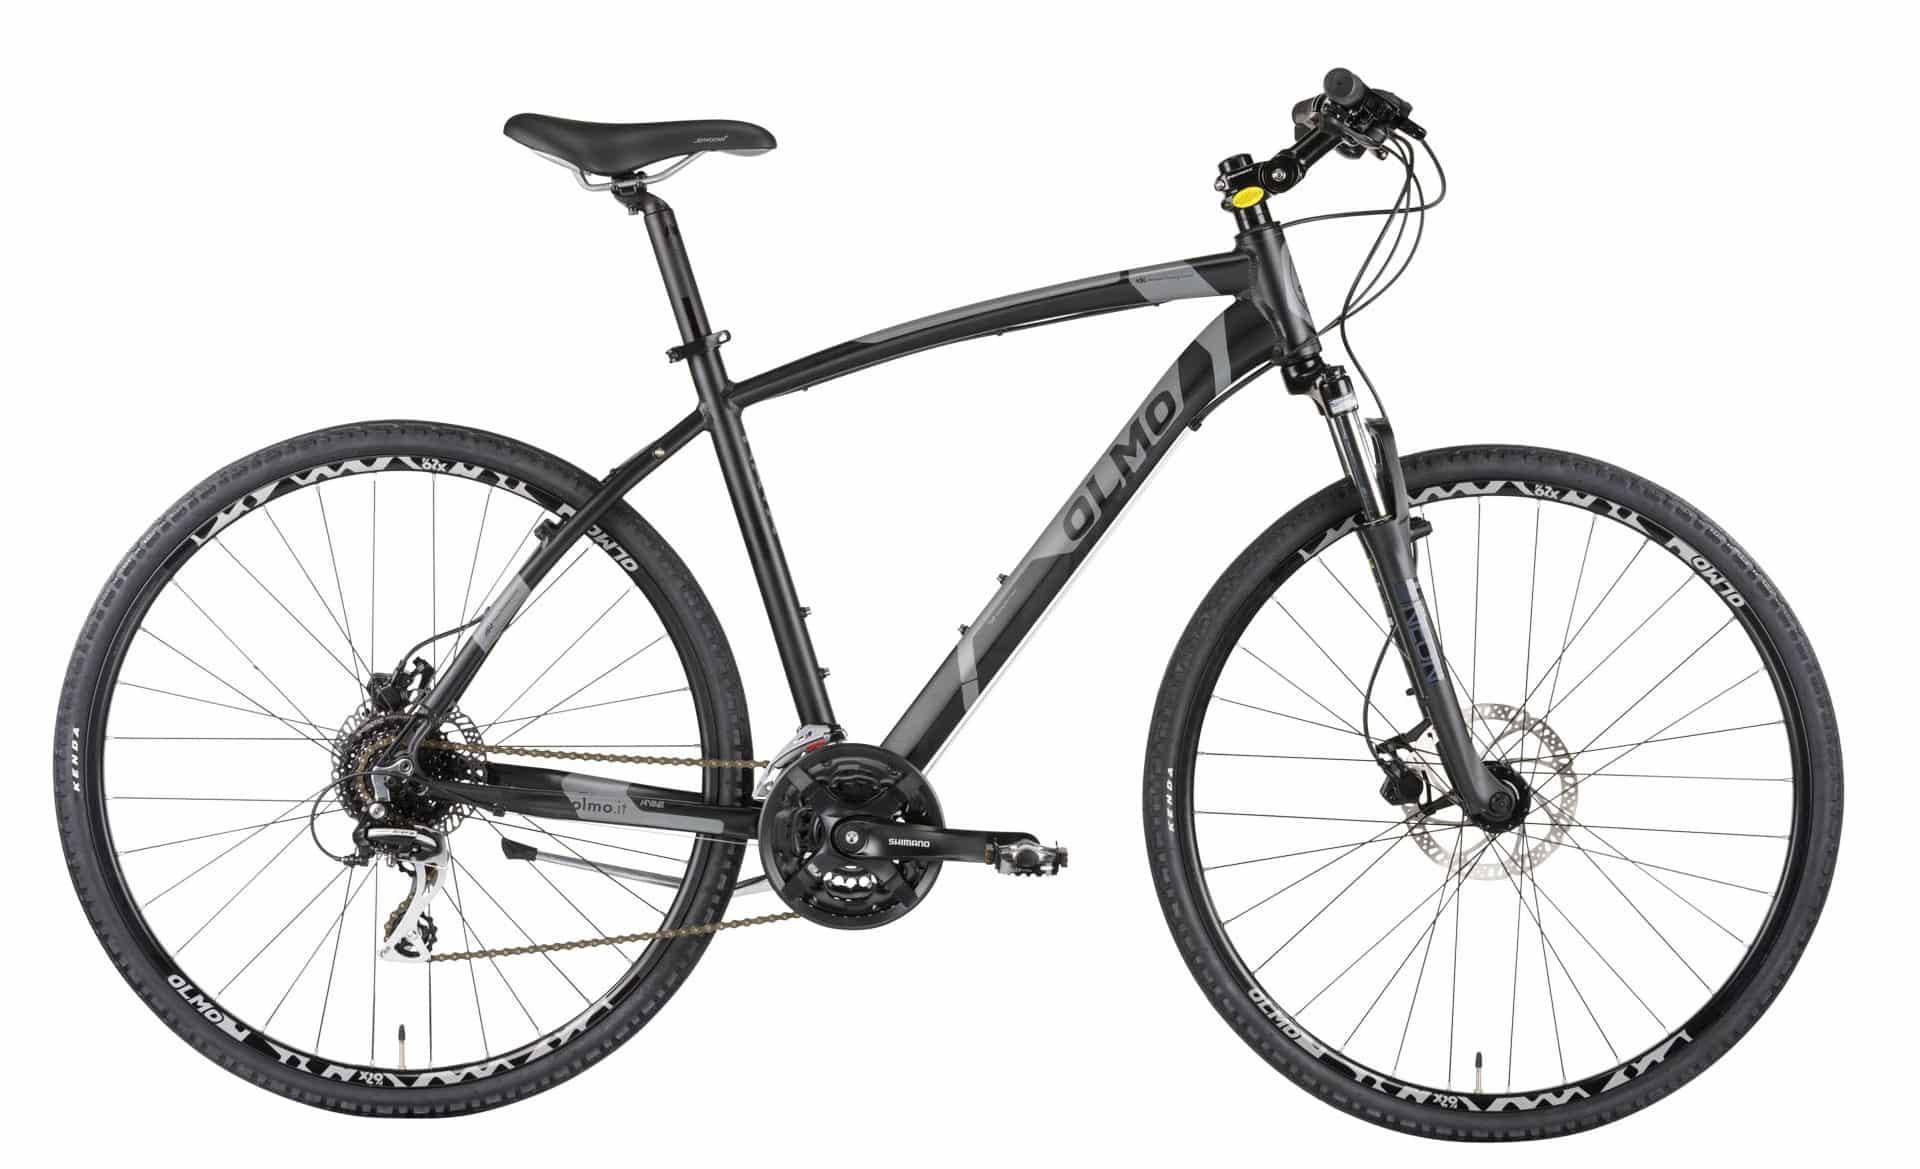 Olmo Biciclette Bici Da Corsa Mountain Bike E Bike E City Bike